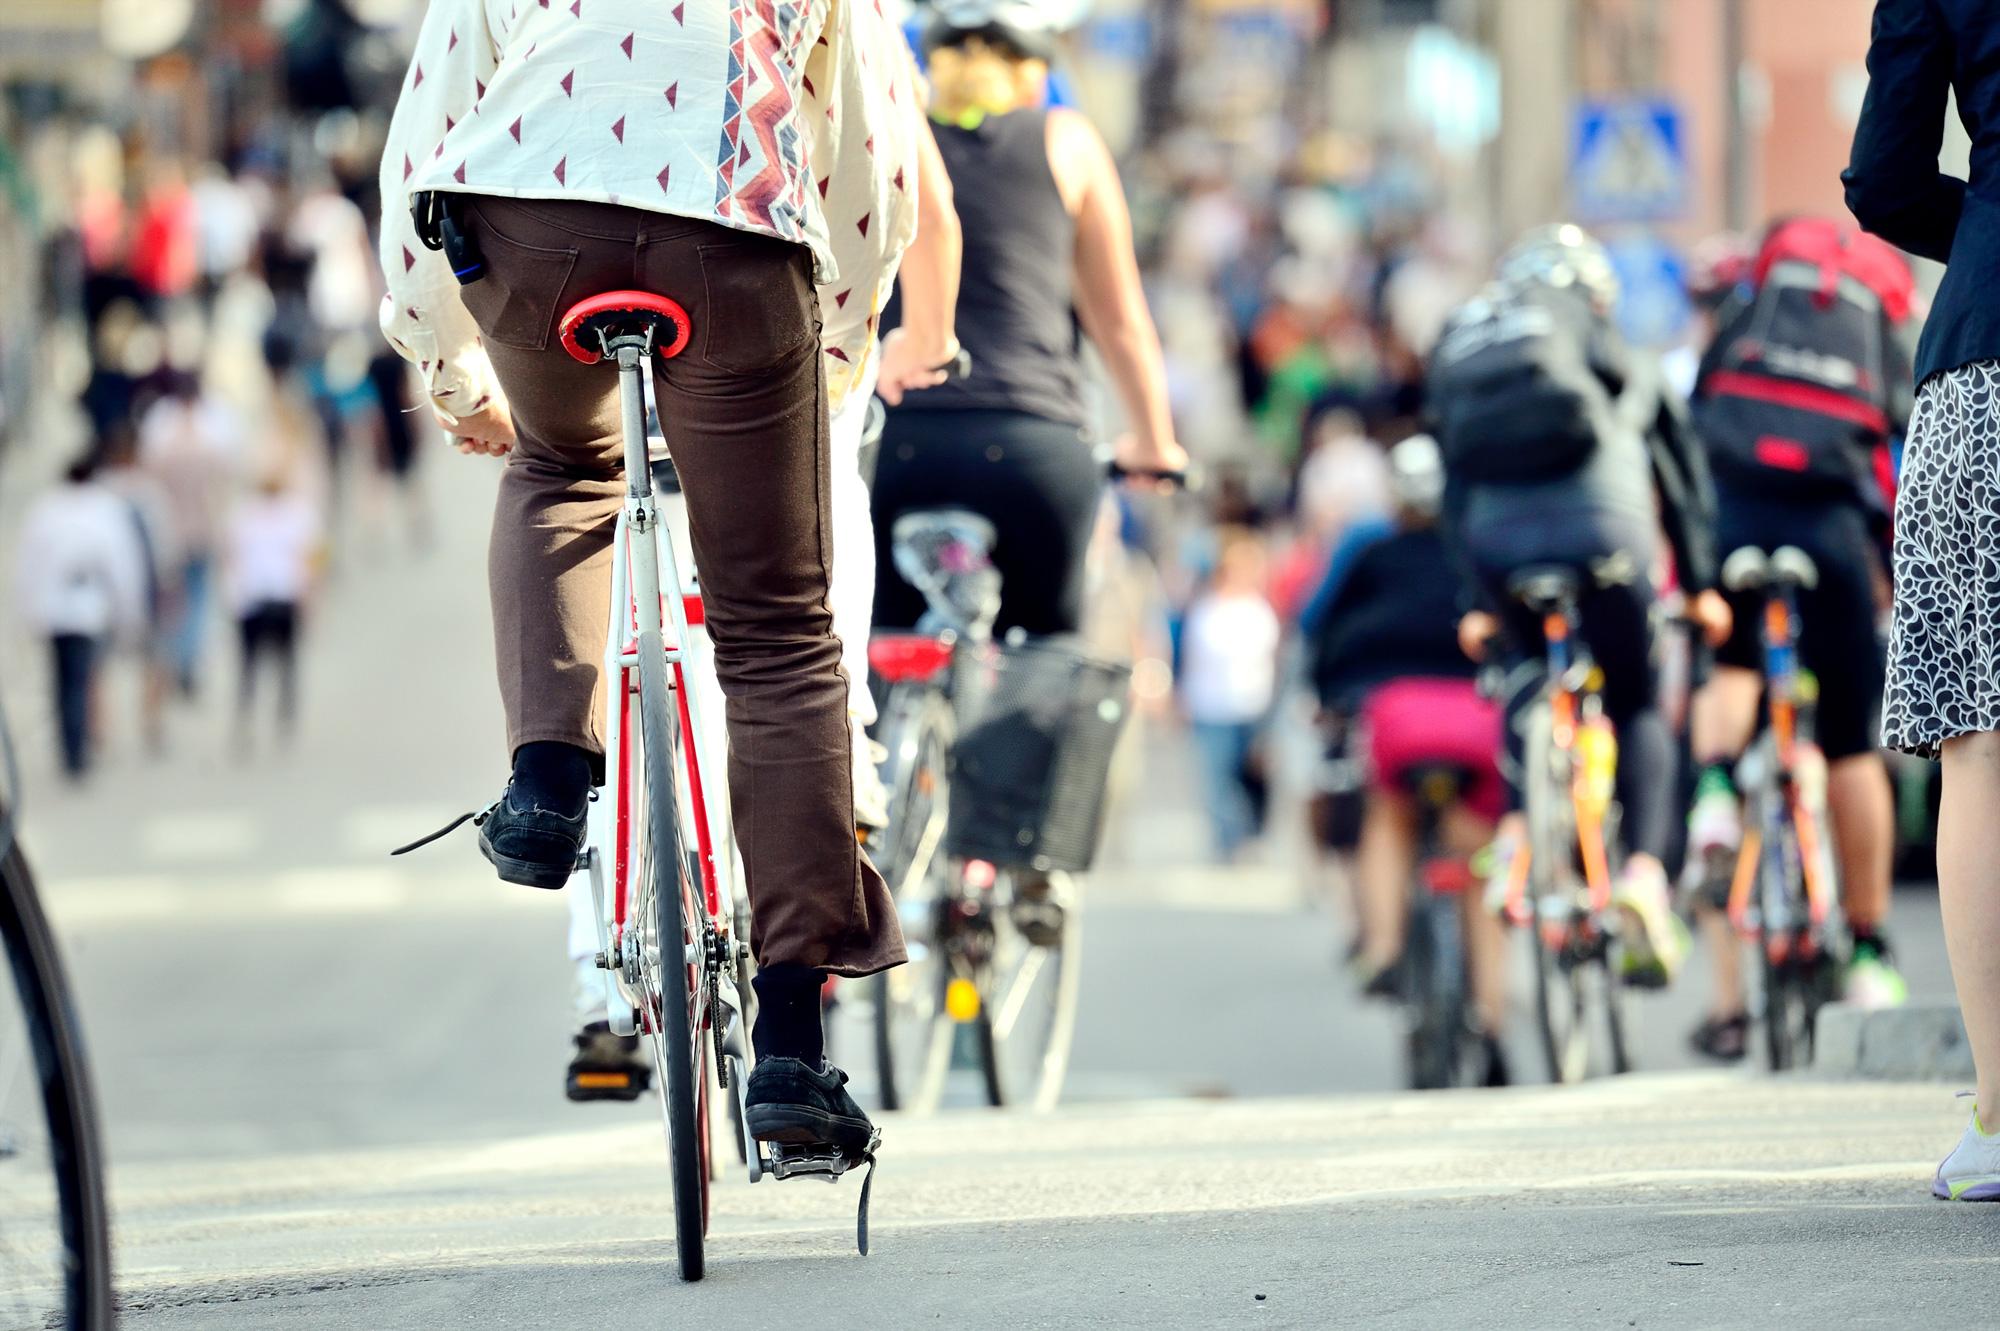 People riding bikes through city